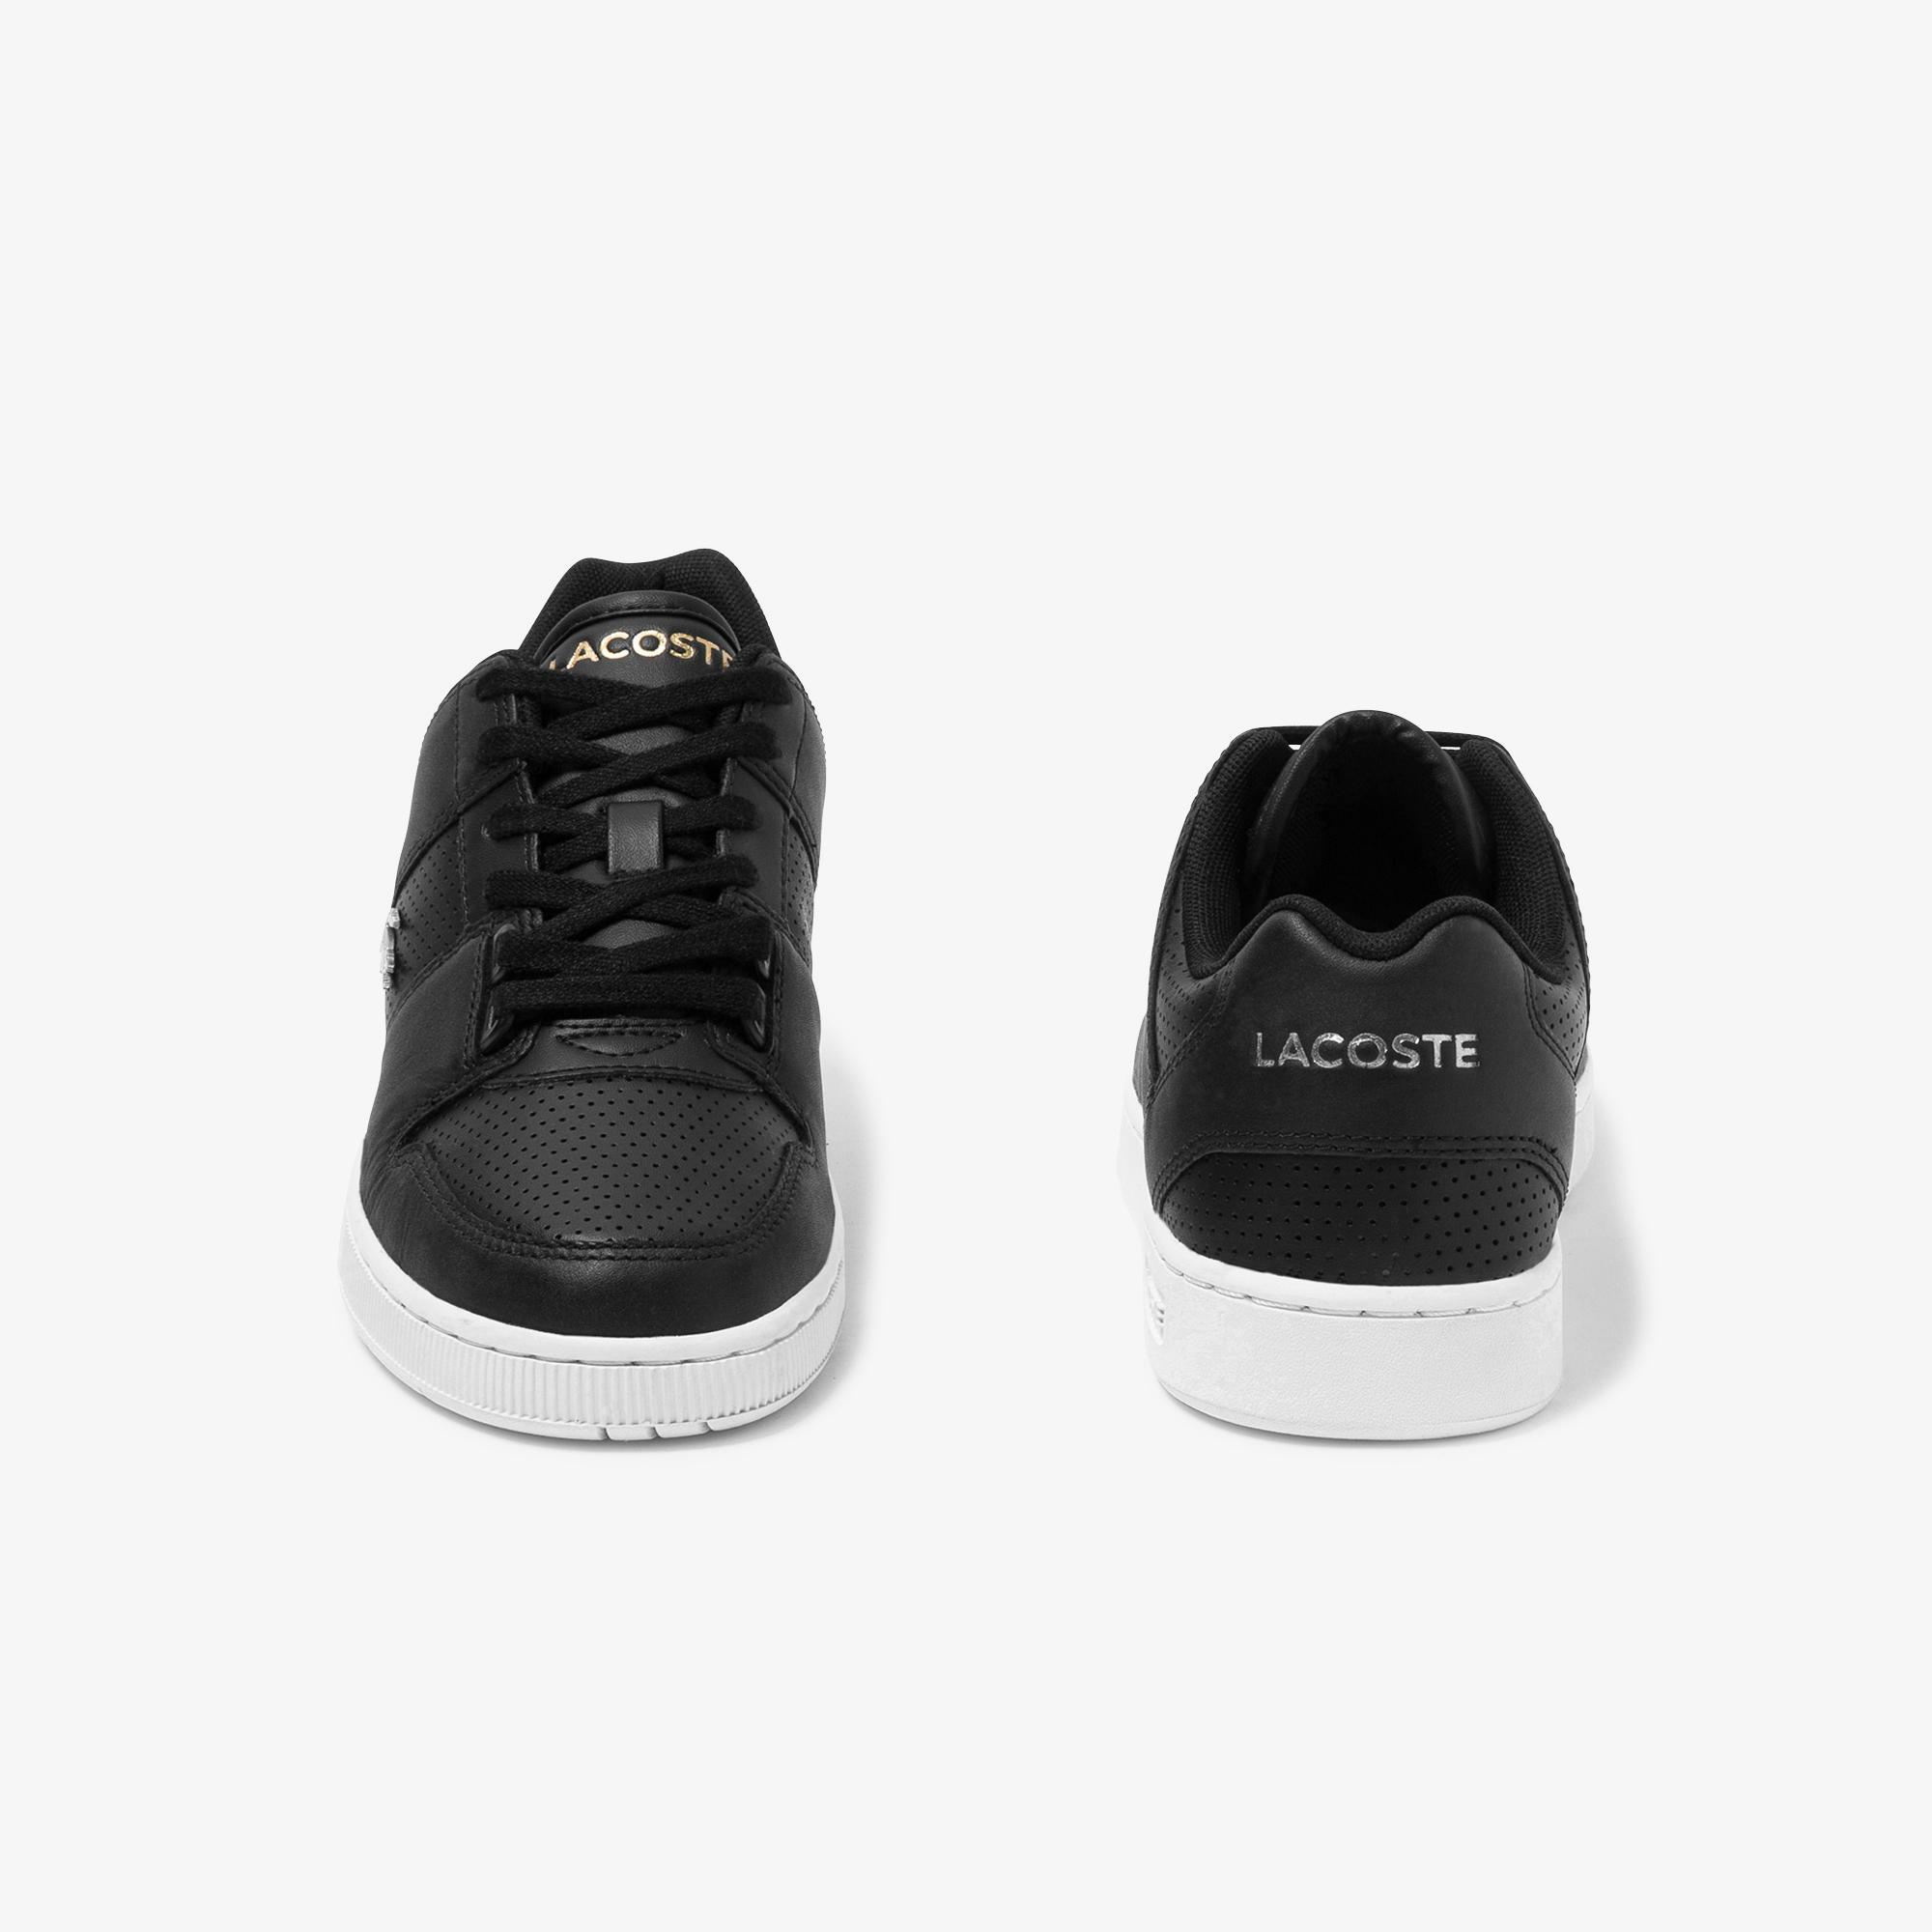 Lacoste Thrill 120 1 Us Sfa Kadın Siyah Deri Sneaker